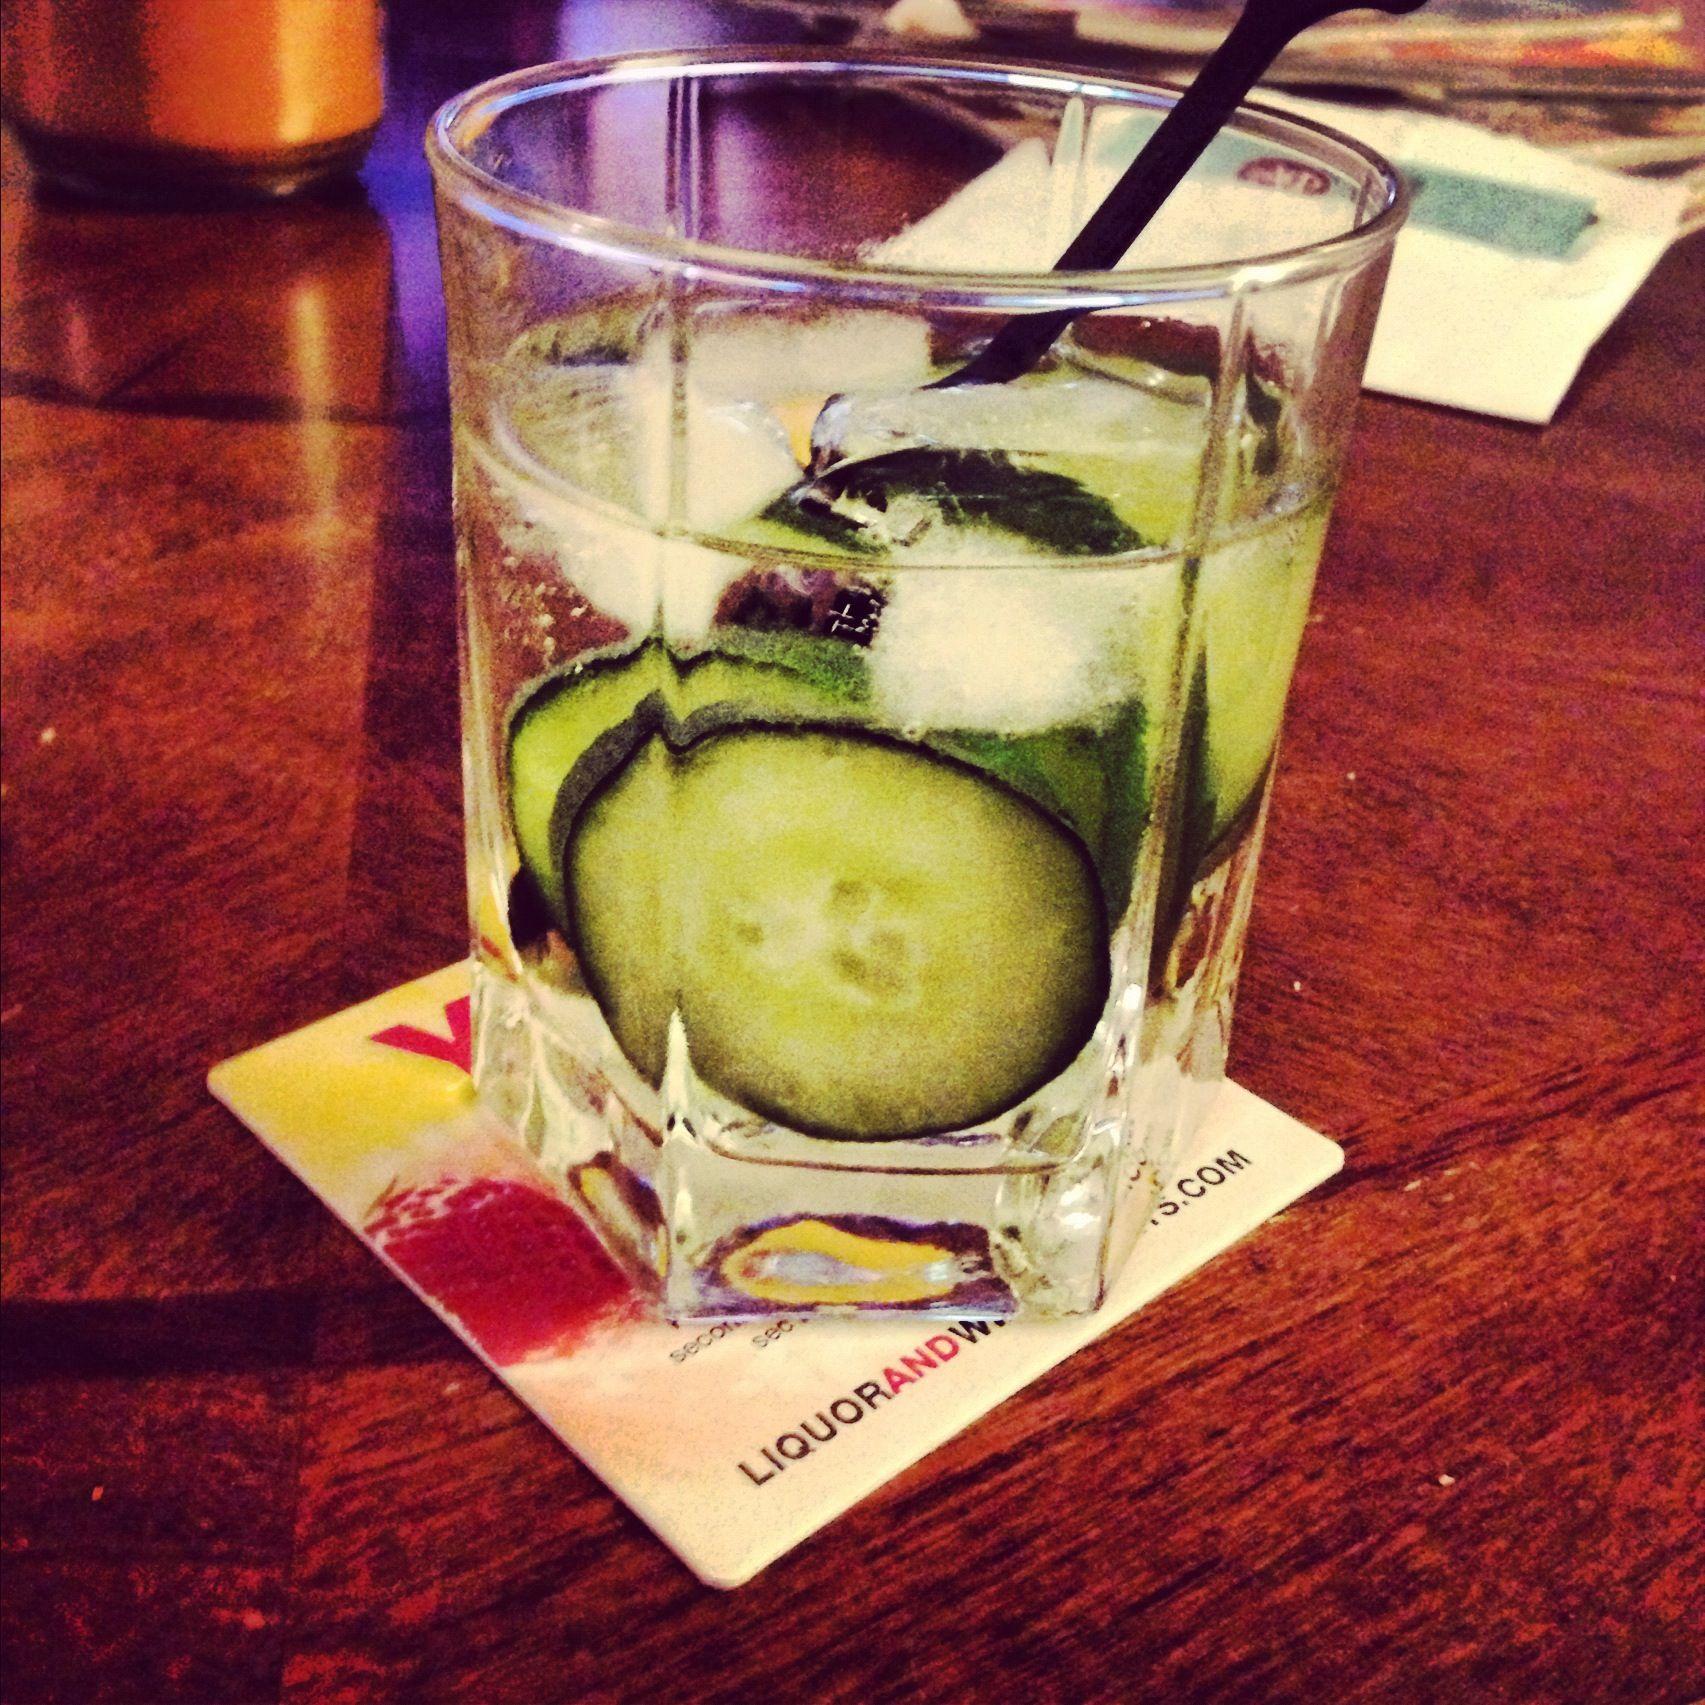 Cucumber cocktail!  Effen cucumber vodka, soda water, sliced cucumber, ice